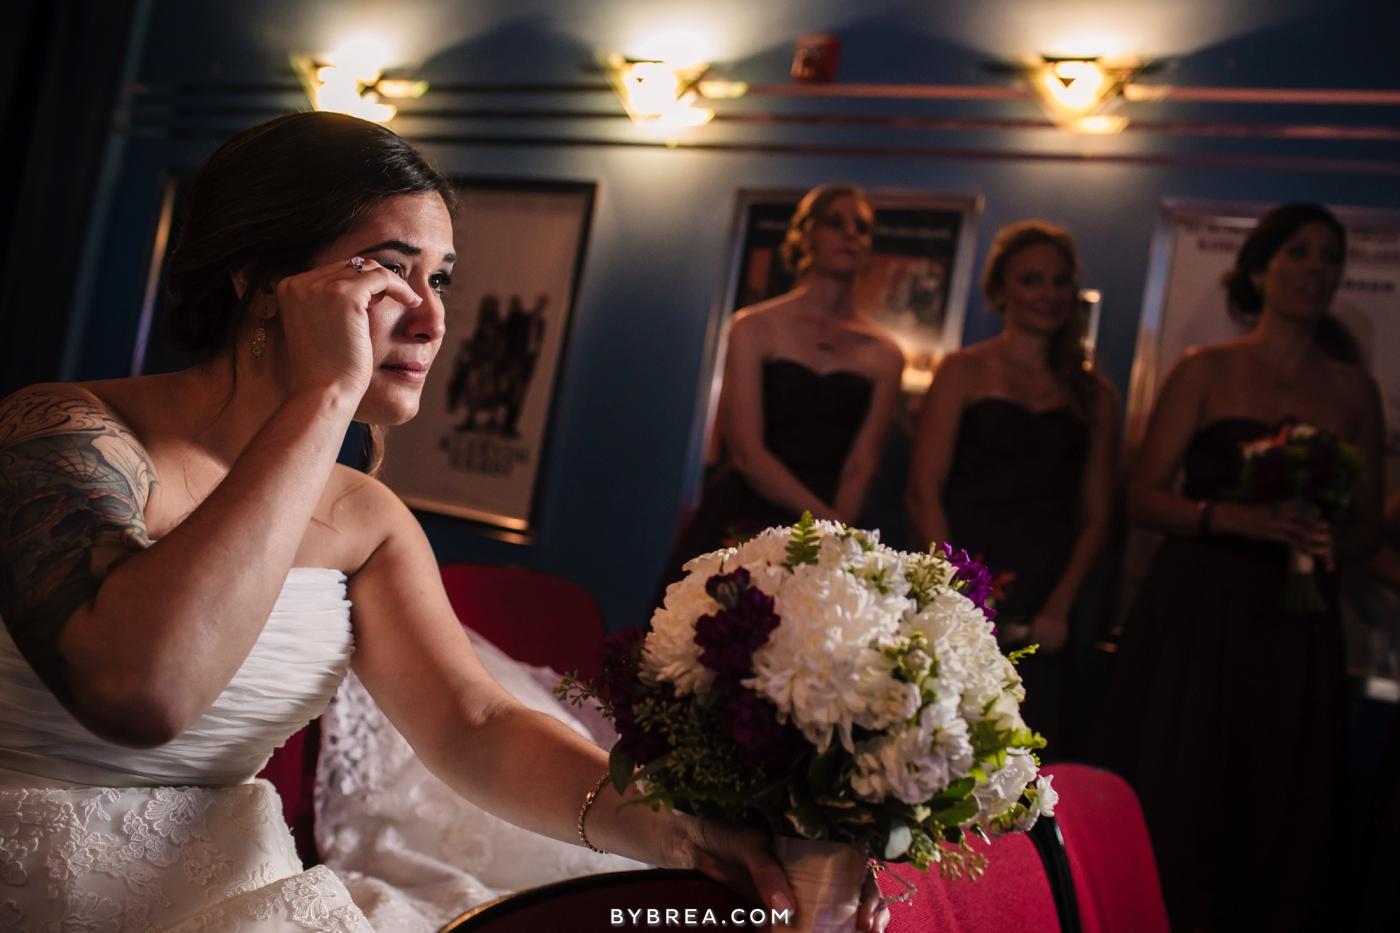 Baltimore wedding photo bride wiping tears